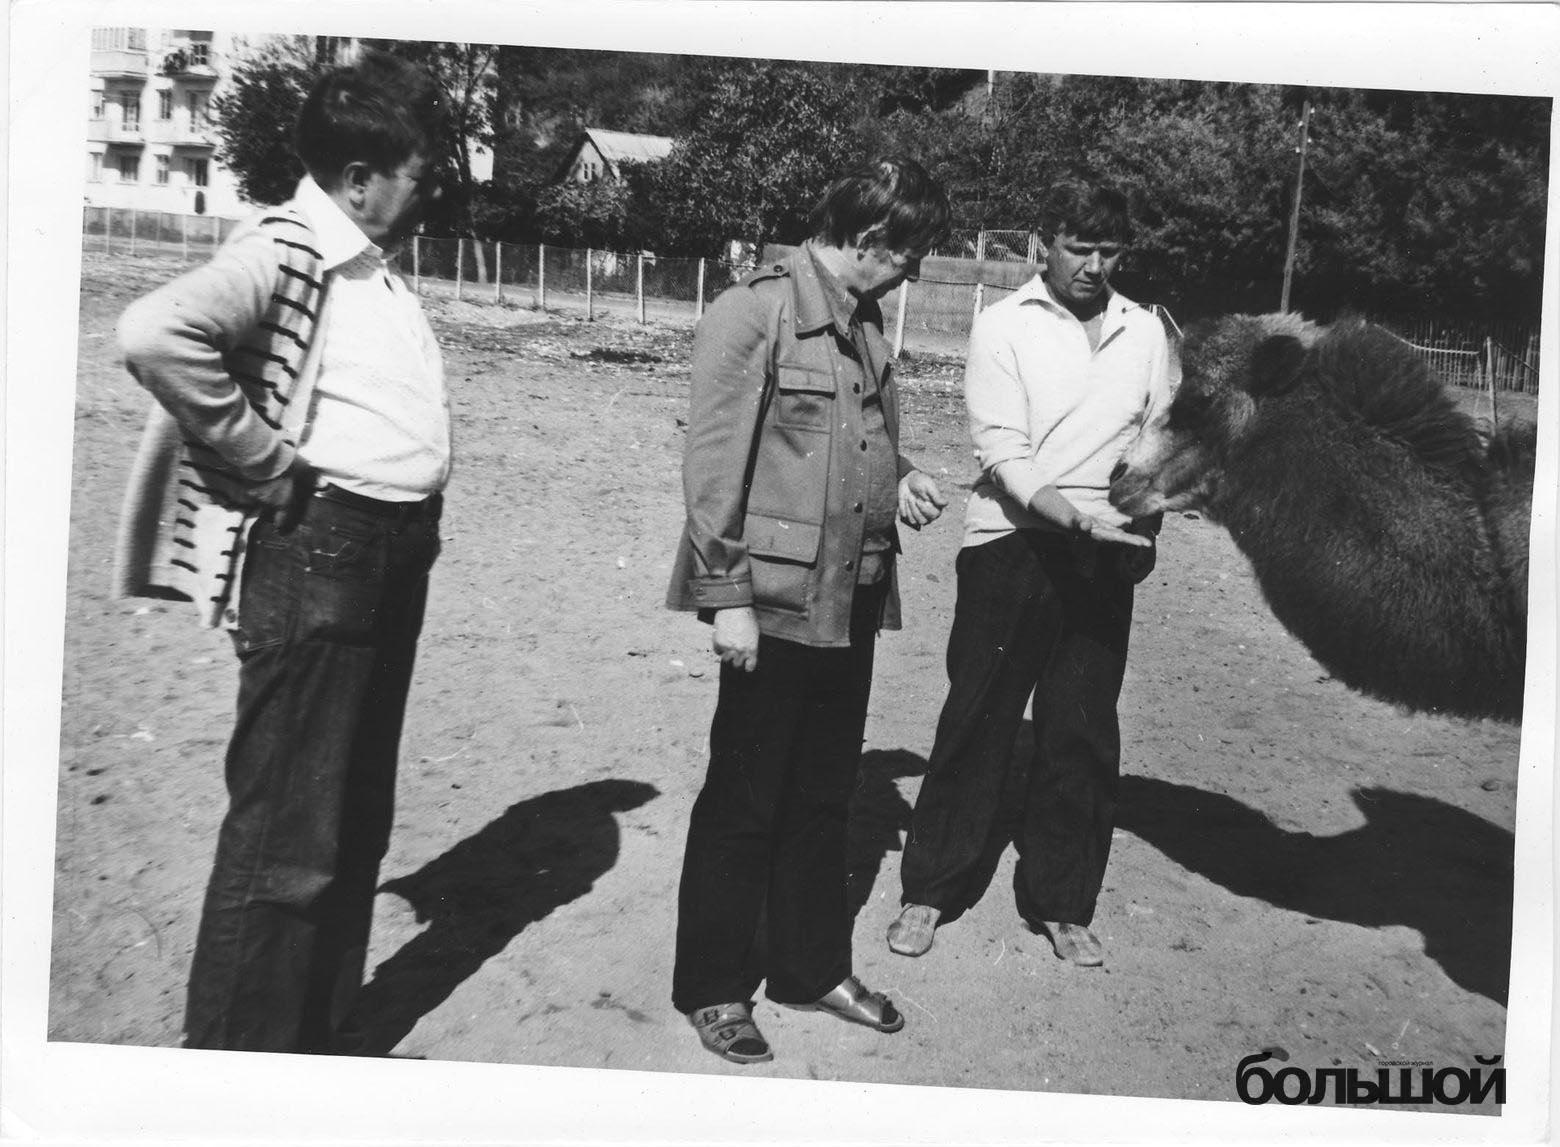 Быкаў, Караткевіч і ... зноў вярблюд